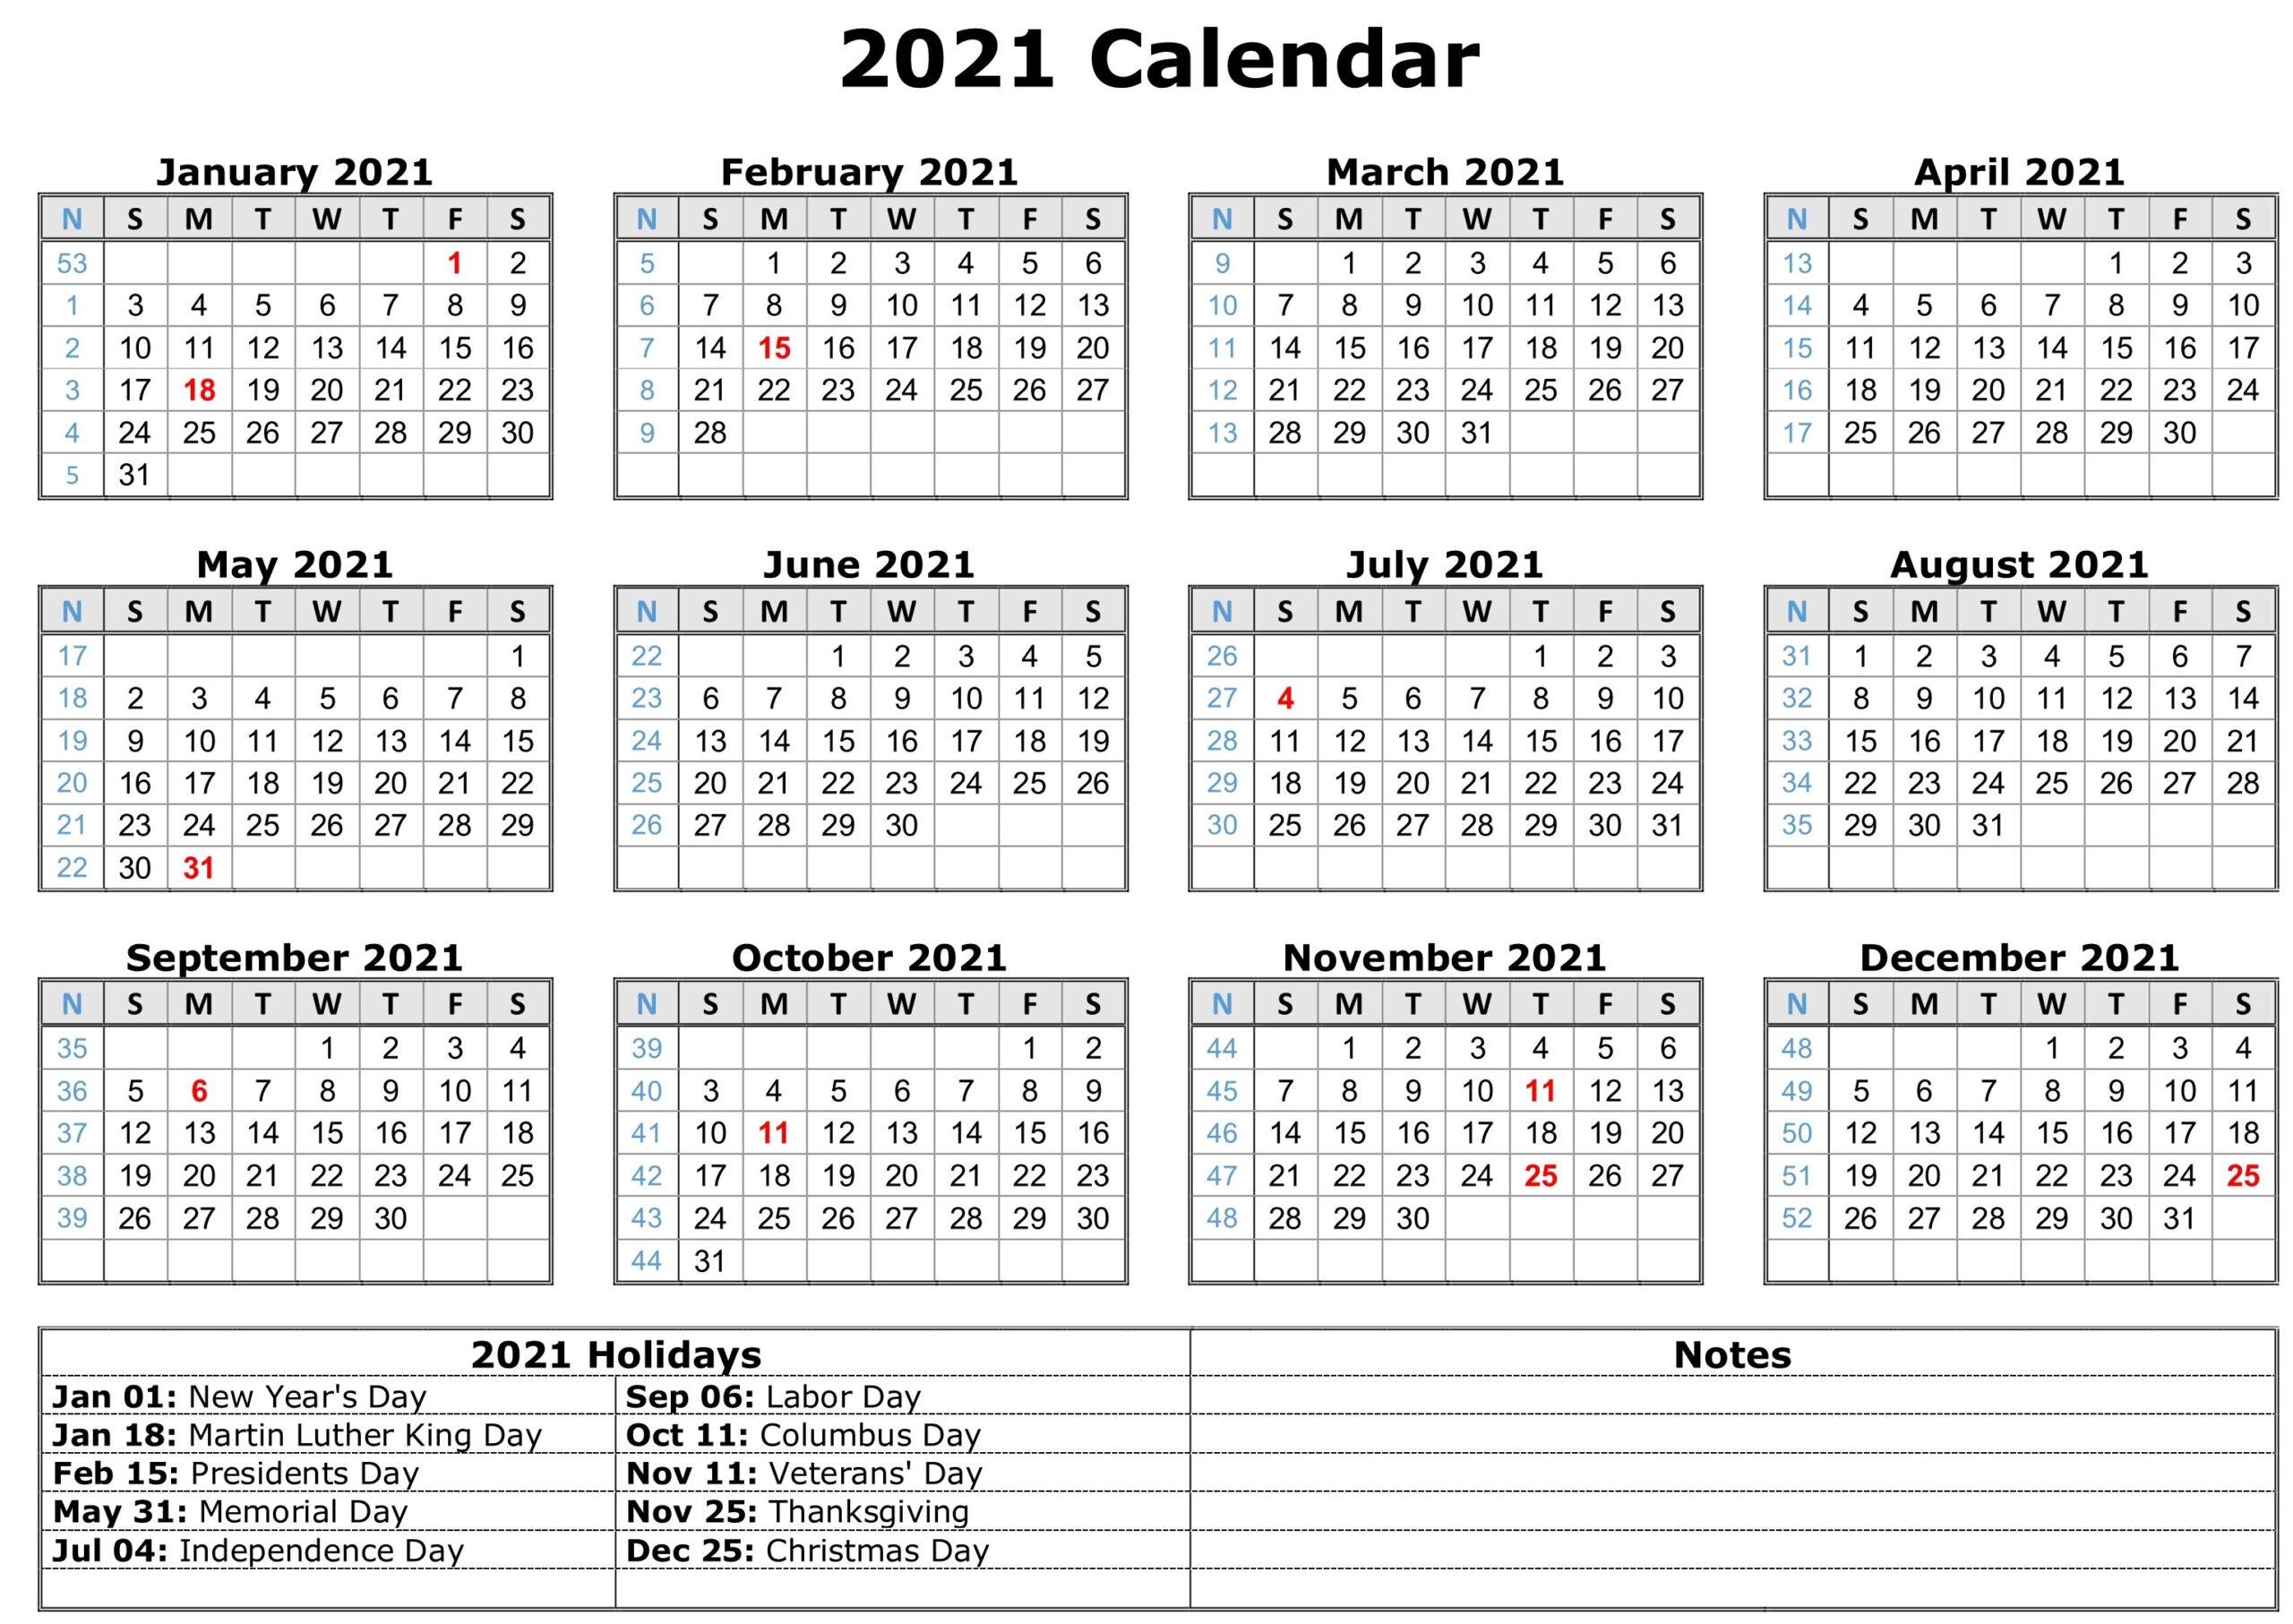 2021 Calendar With Holidays | Free Calendar Template inside Calendar Fill In 2021